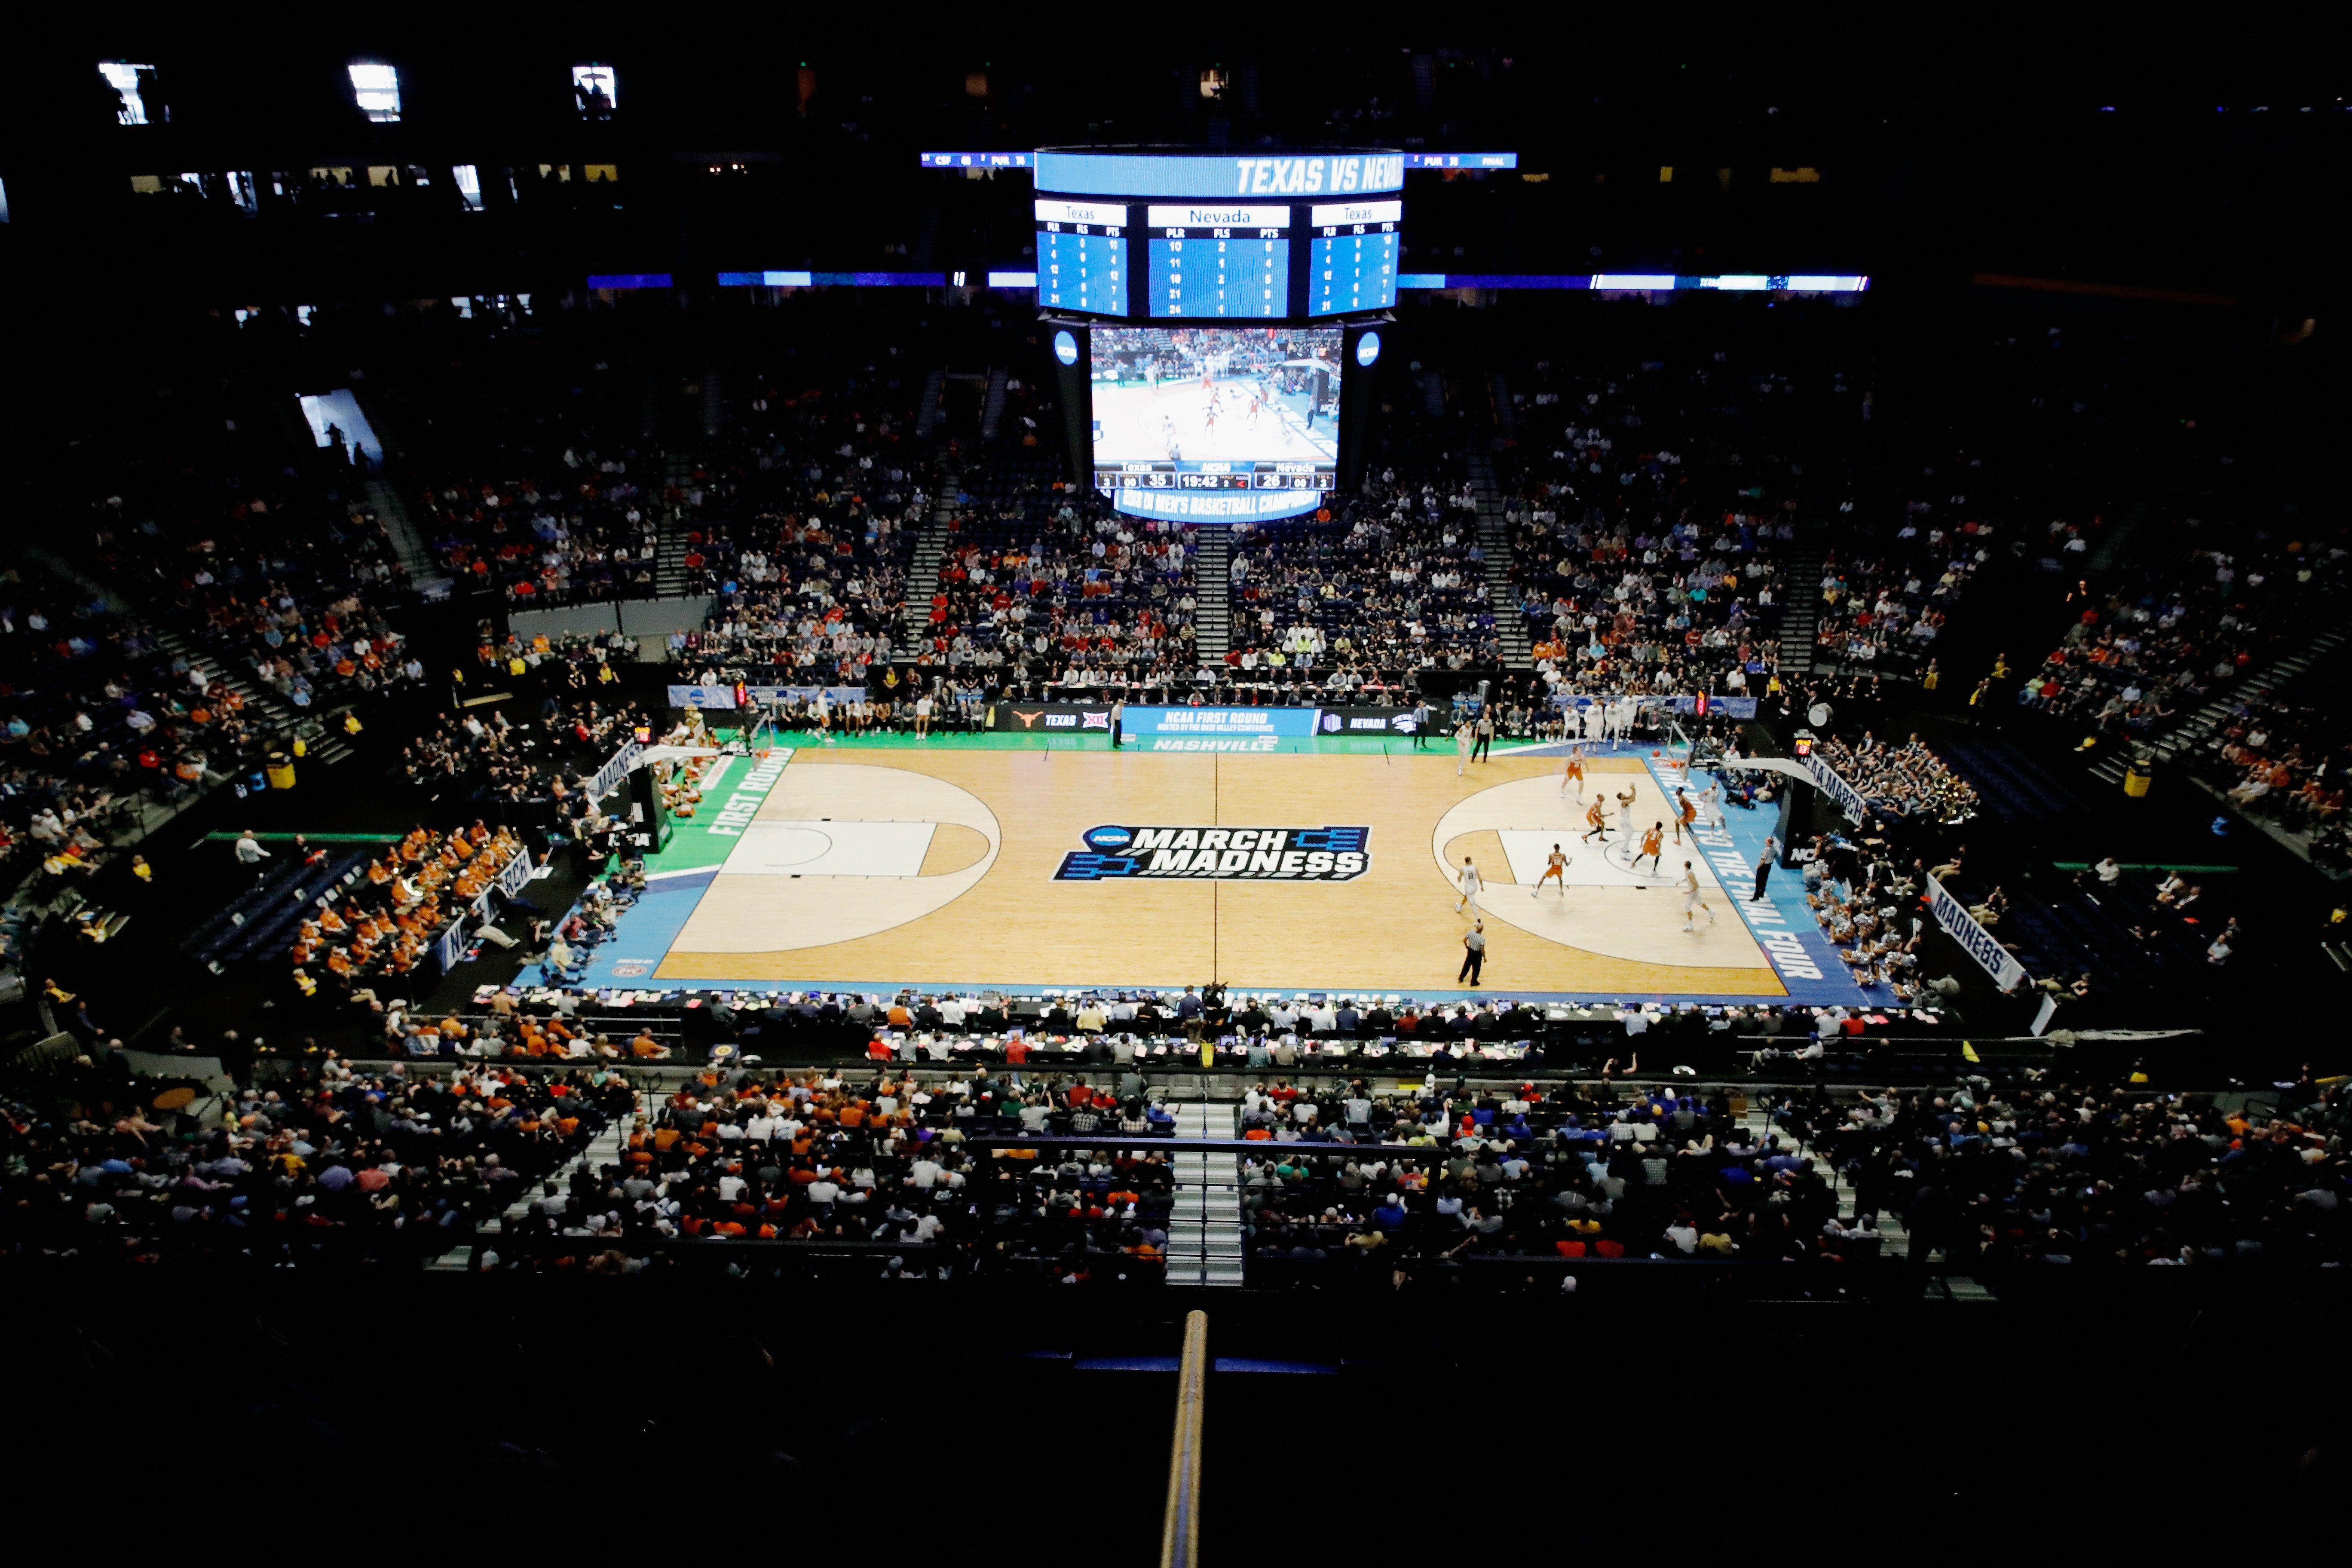 Game times/TV listings for 2019 NCAA men's basketball